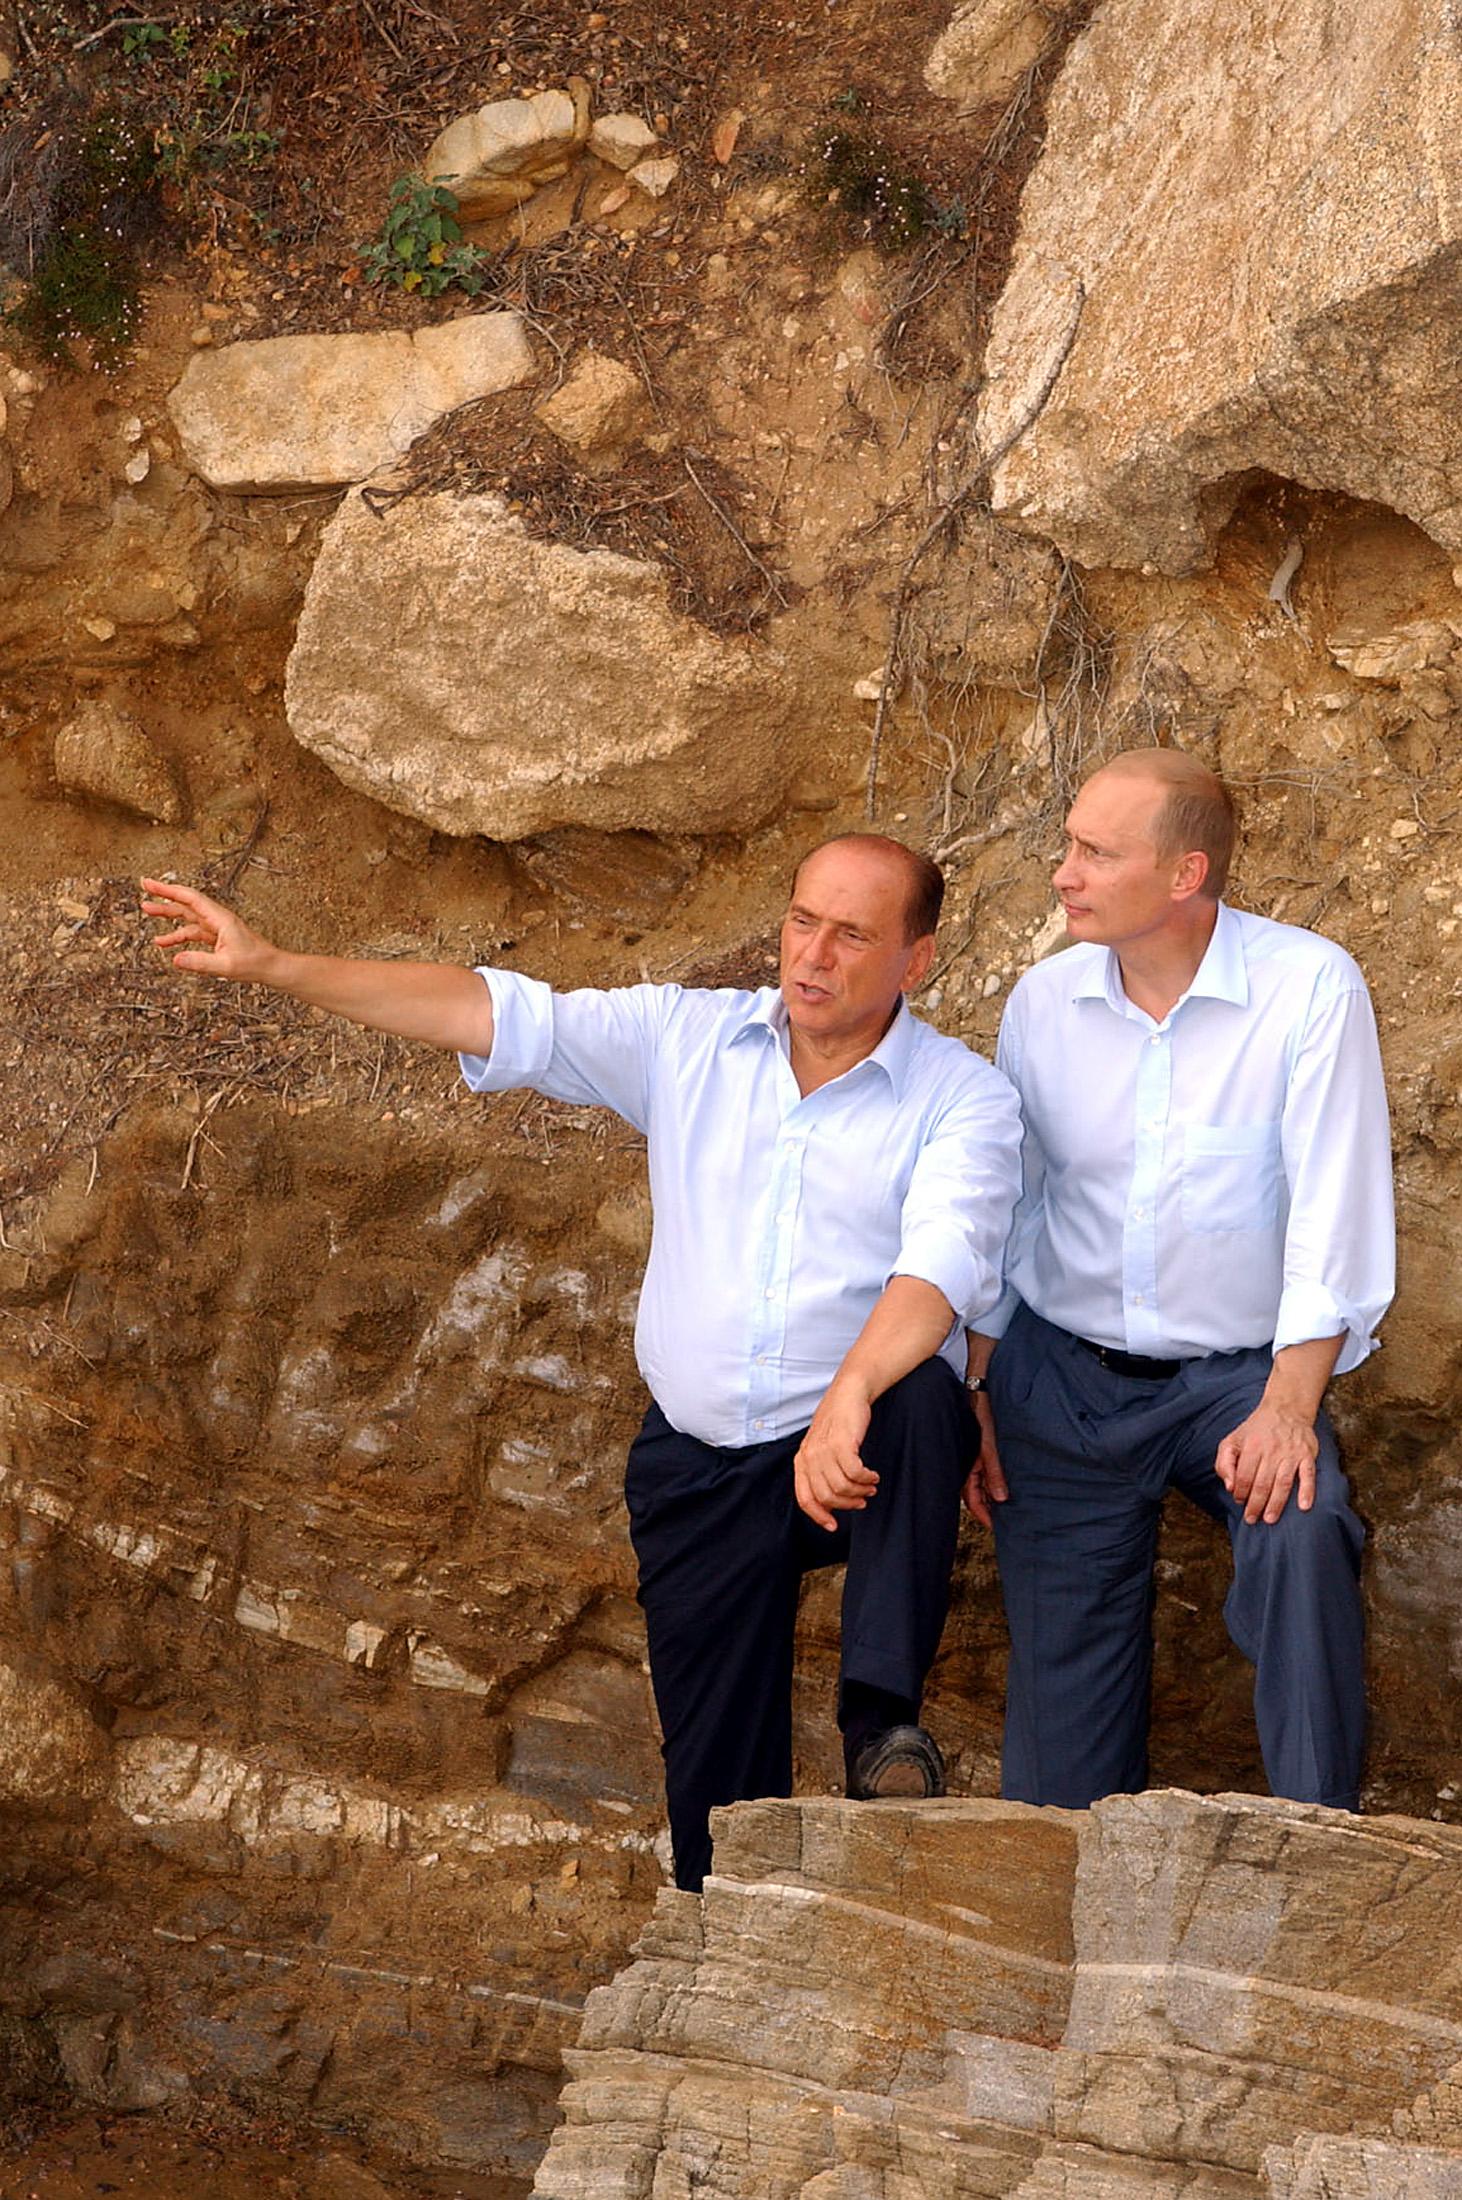 Berlusconi and Putin hang out in VillaCertosa